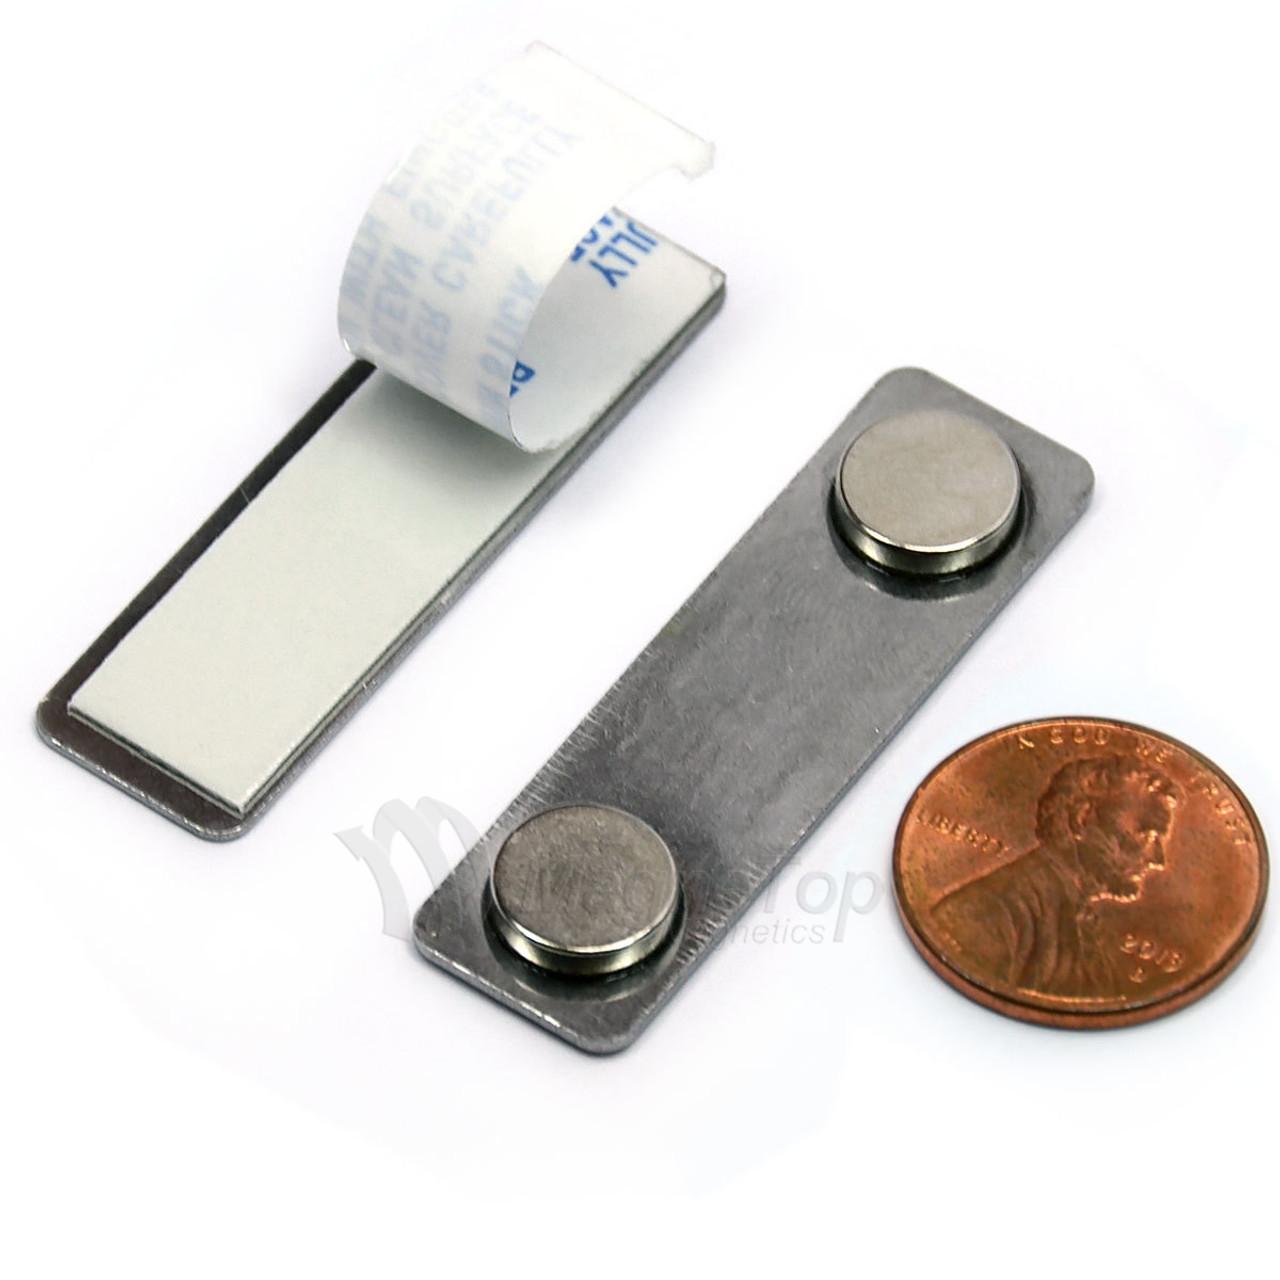 Name Tag Badge Magnet  Set of 1 /w Adhesive 2MG1